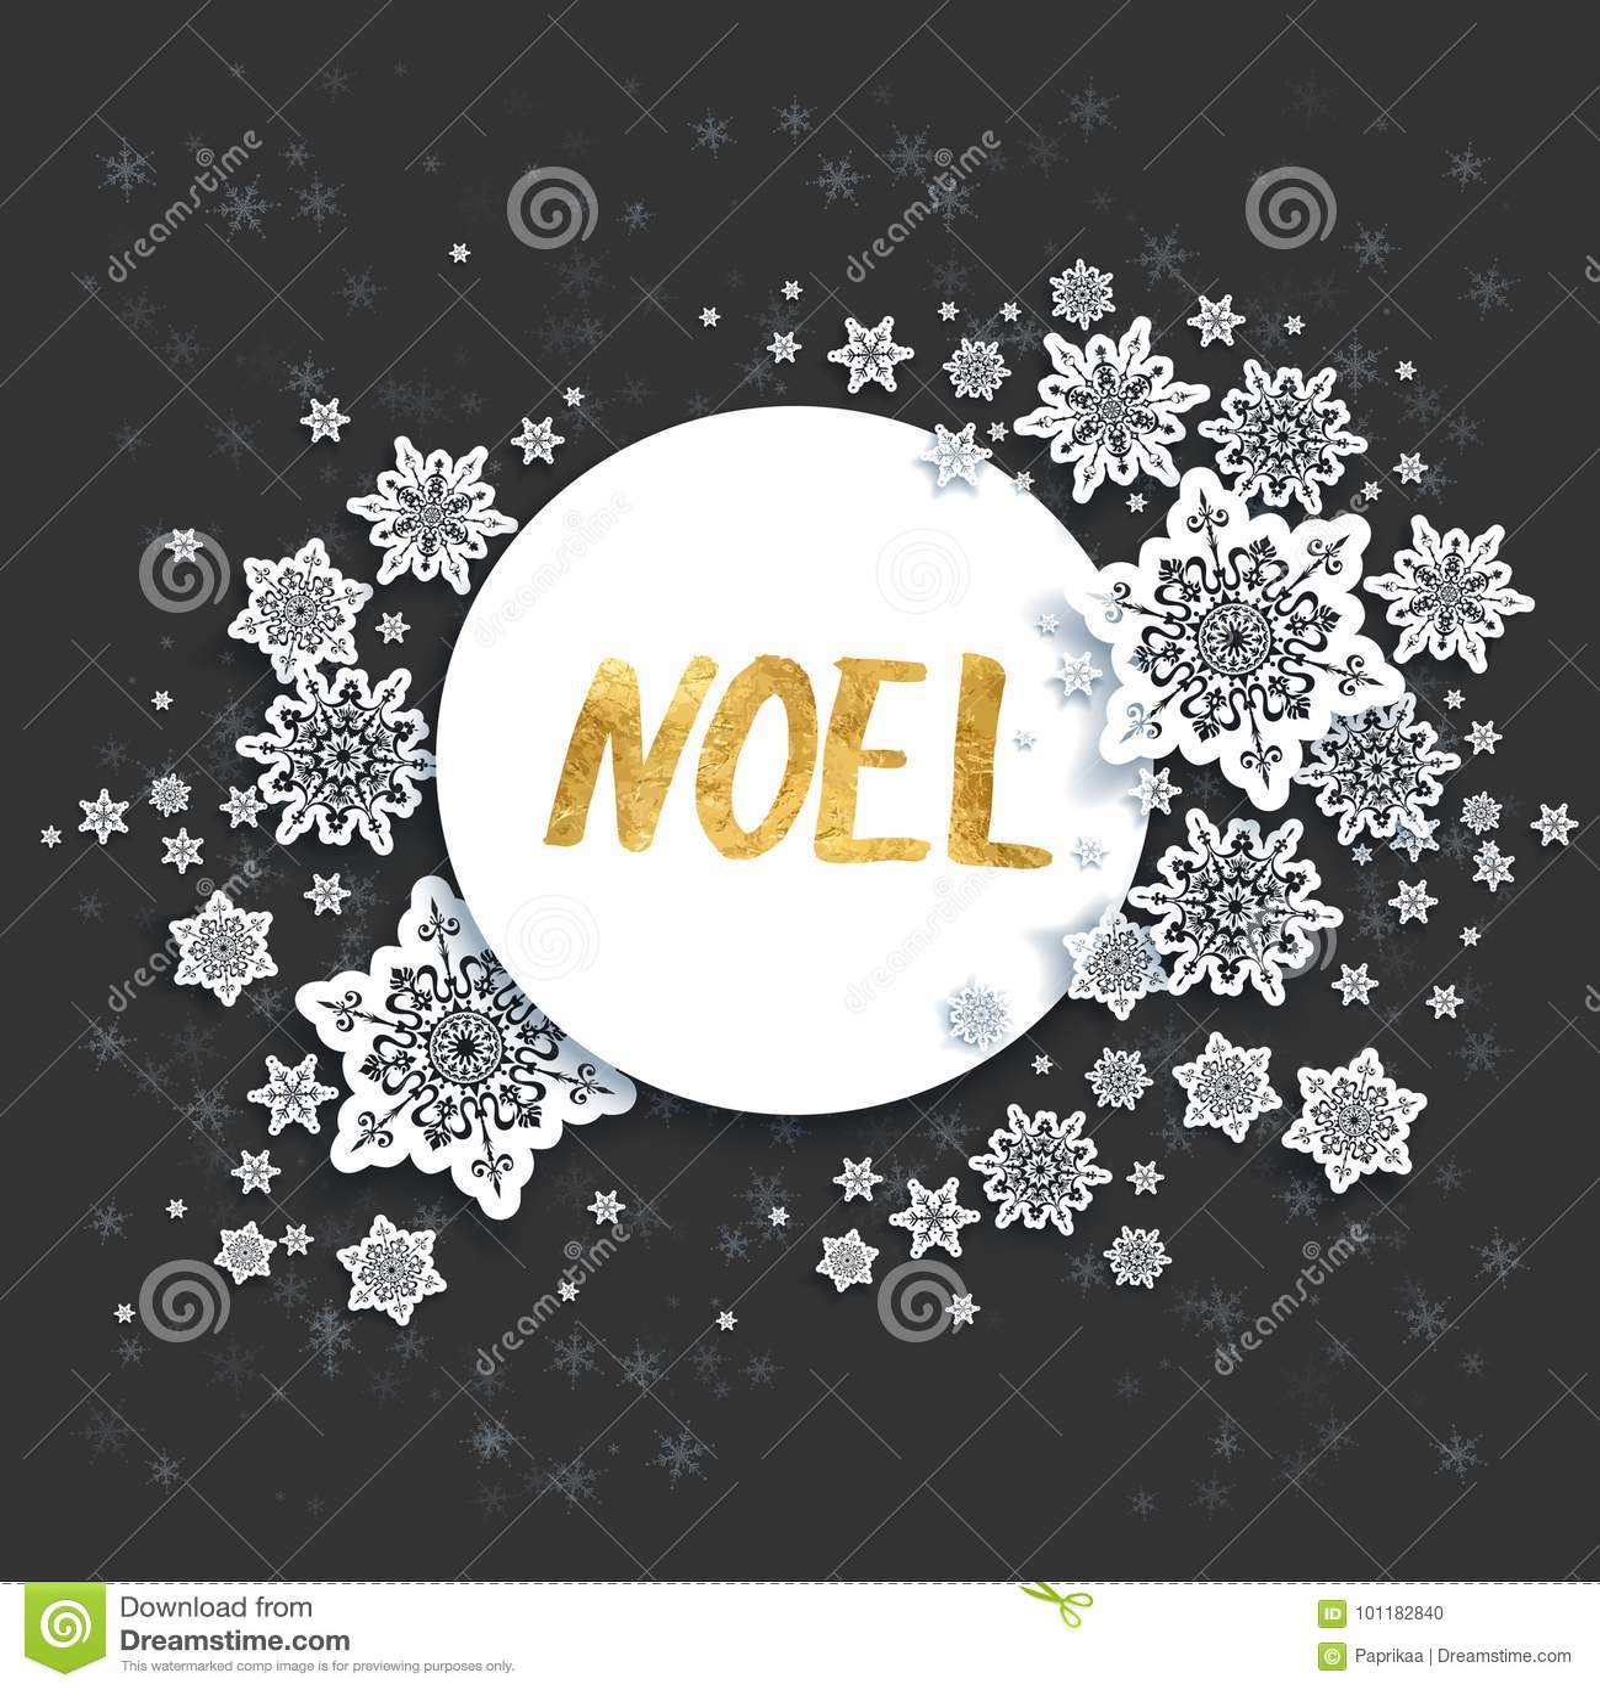 Noel Black Christmas Card Stock Vector Illustration Of Message